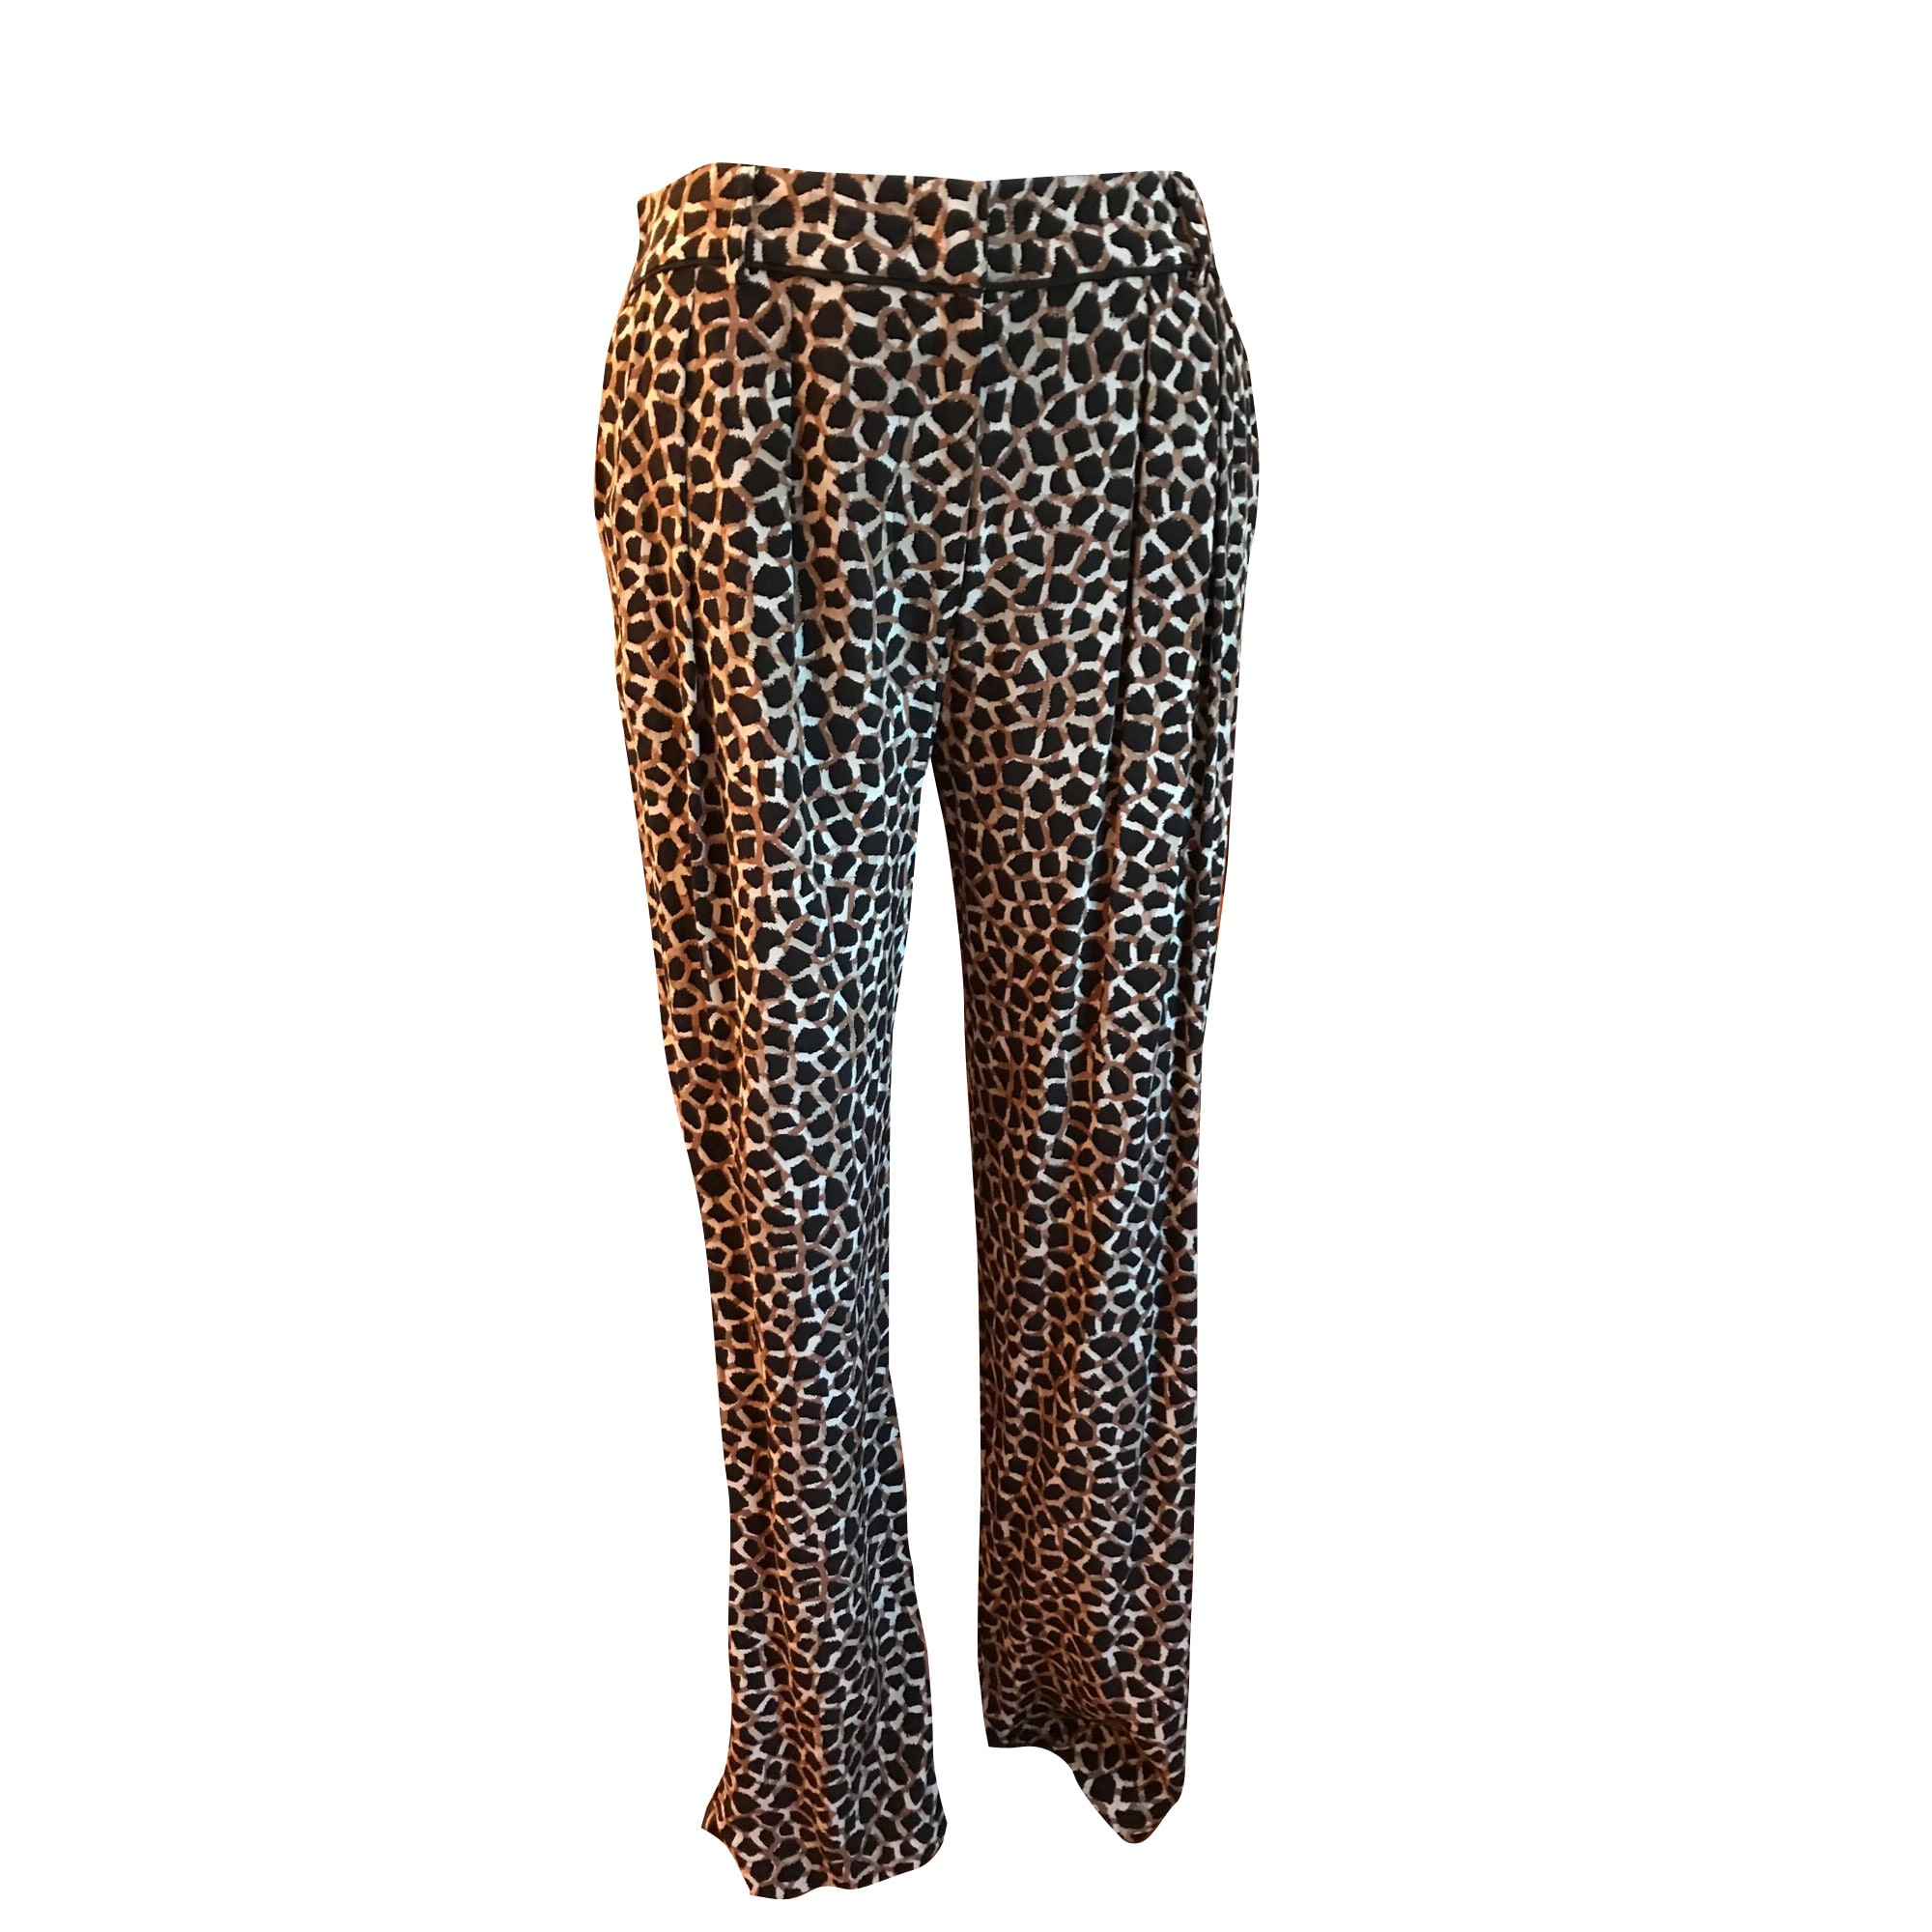 Pantalon droit GERARD DAREL Imprimés animaliers